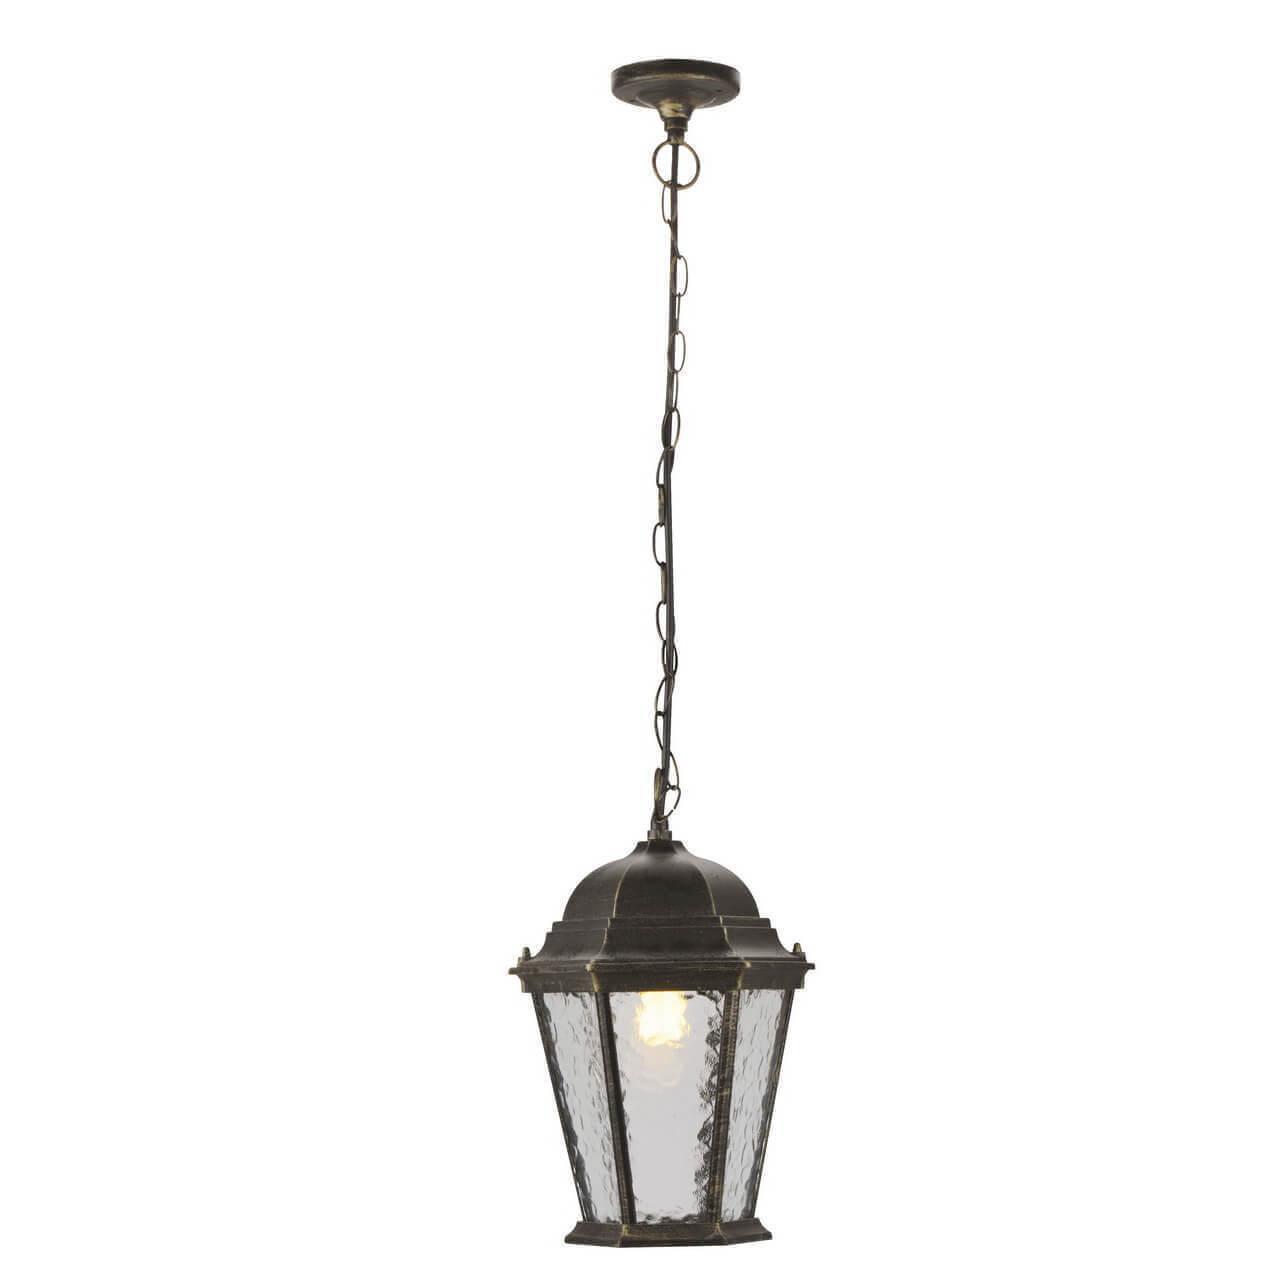 Уличный светильник Arte Lamp A1205SO-1BN, E27 цены